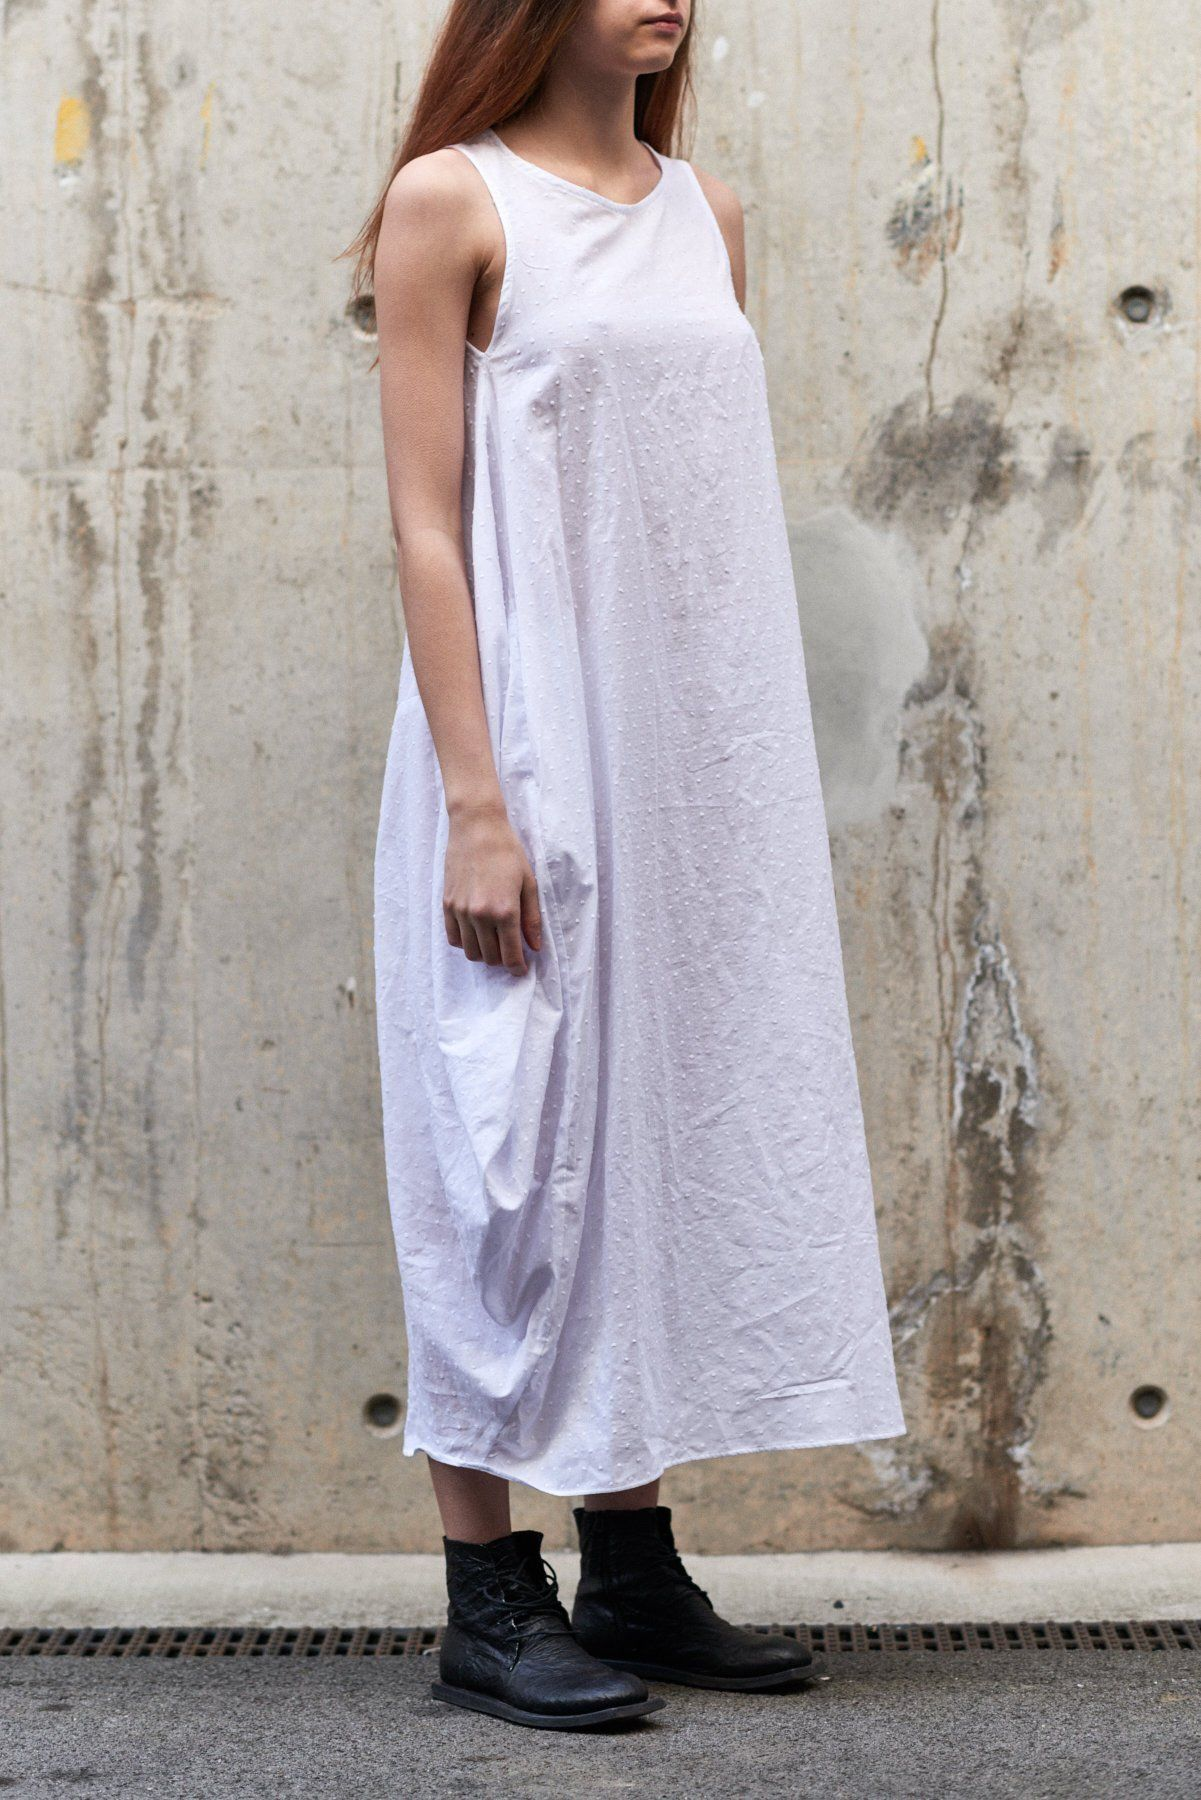 White Oversized Dress Loose Dress Minimalist Dress Cotton Dress Sleeveless Casual Cotton Dress Extravagant Dress Aryasense 8klbwa19 Casual Cotton Dress Minimalist Dresses Oversized Dress [ 1800 x 1201 Pixel ]